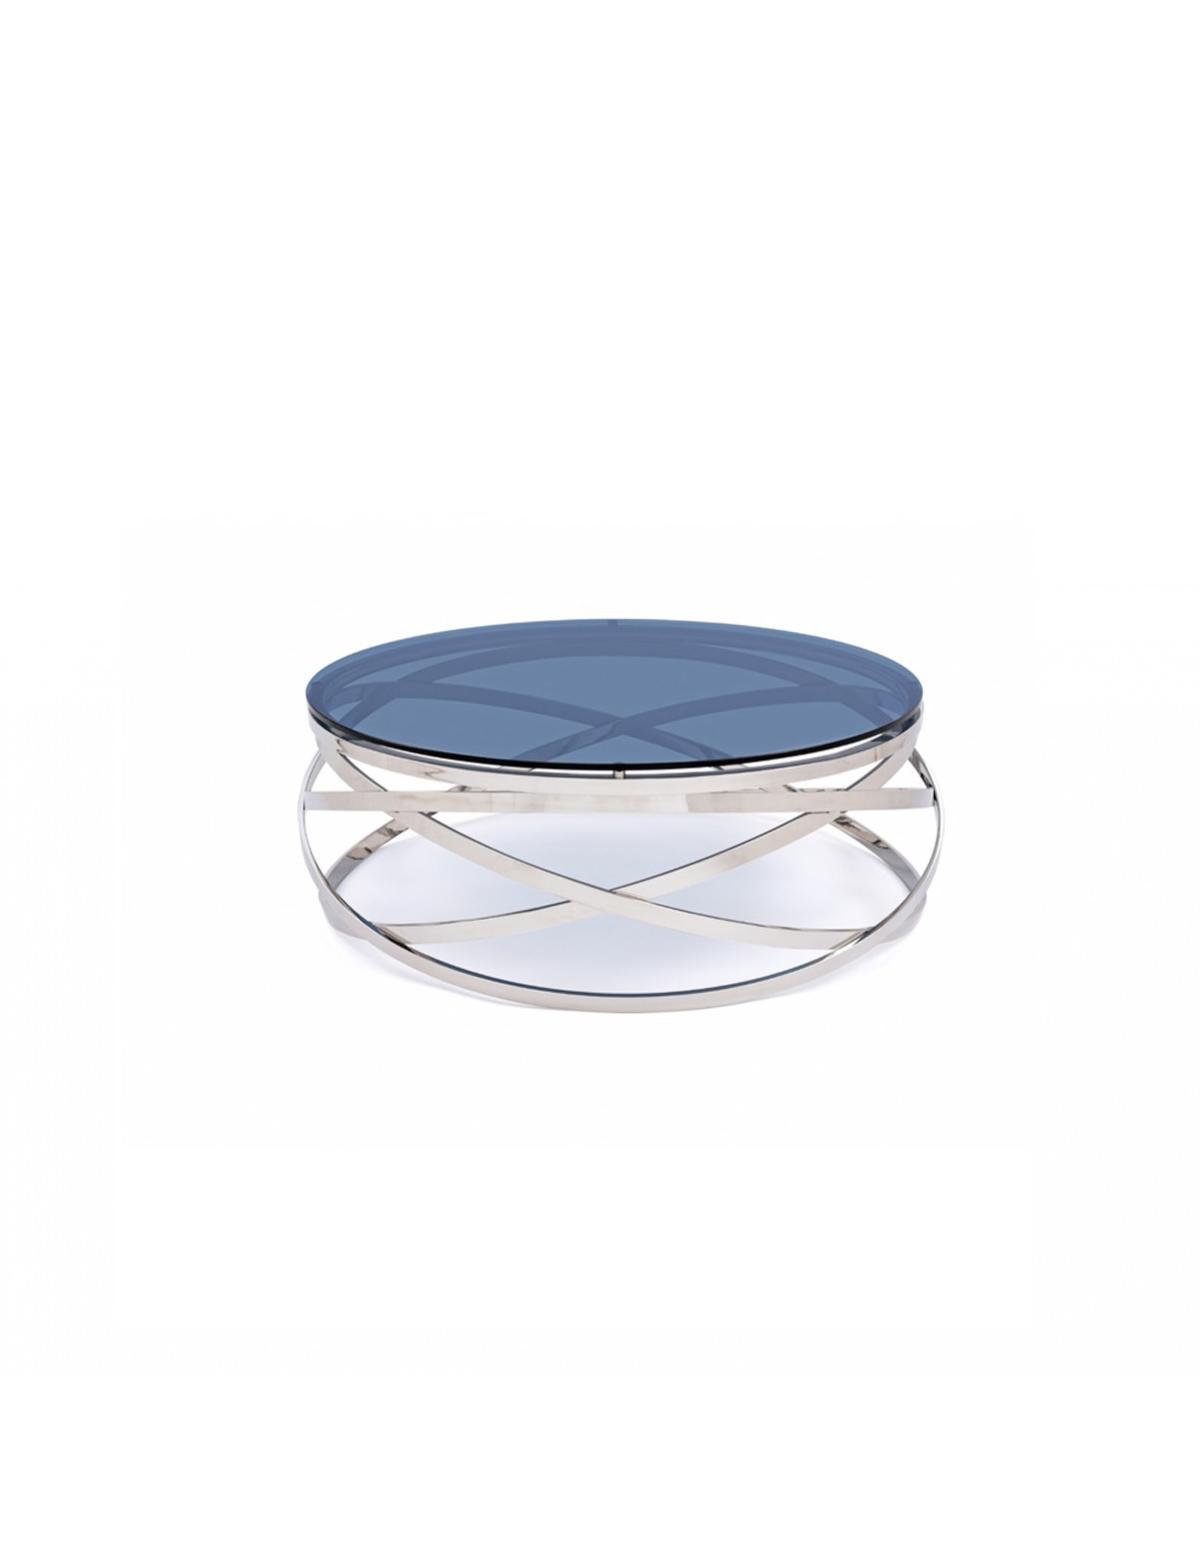 Orbit Coffee Table Lux Lounge EFR - Orbit coffee table